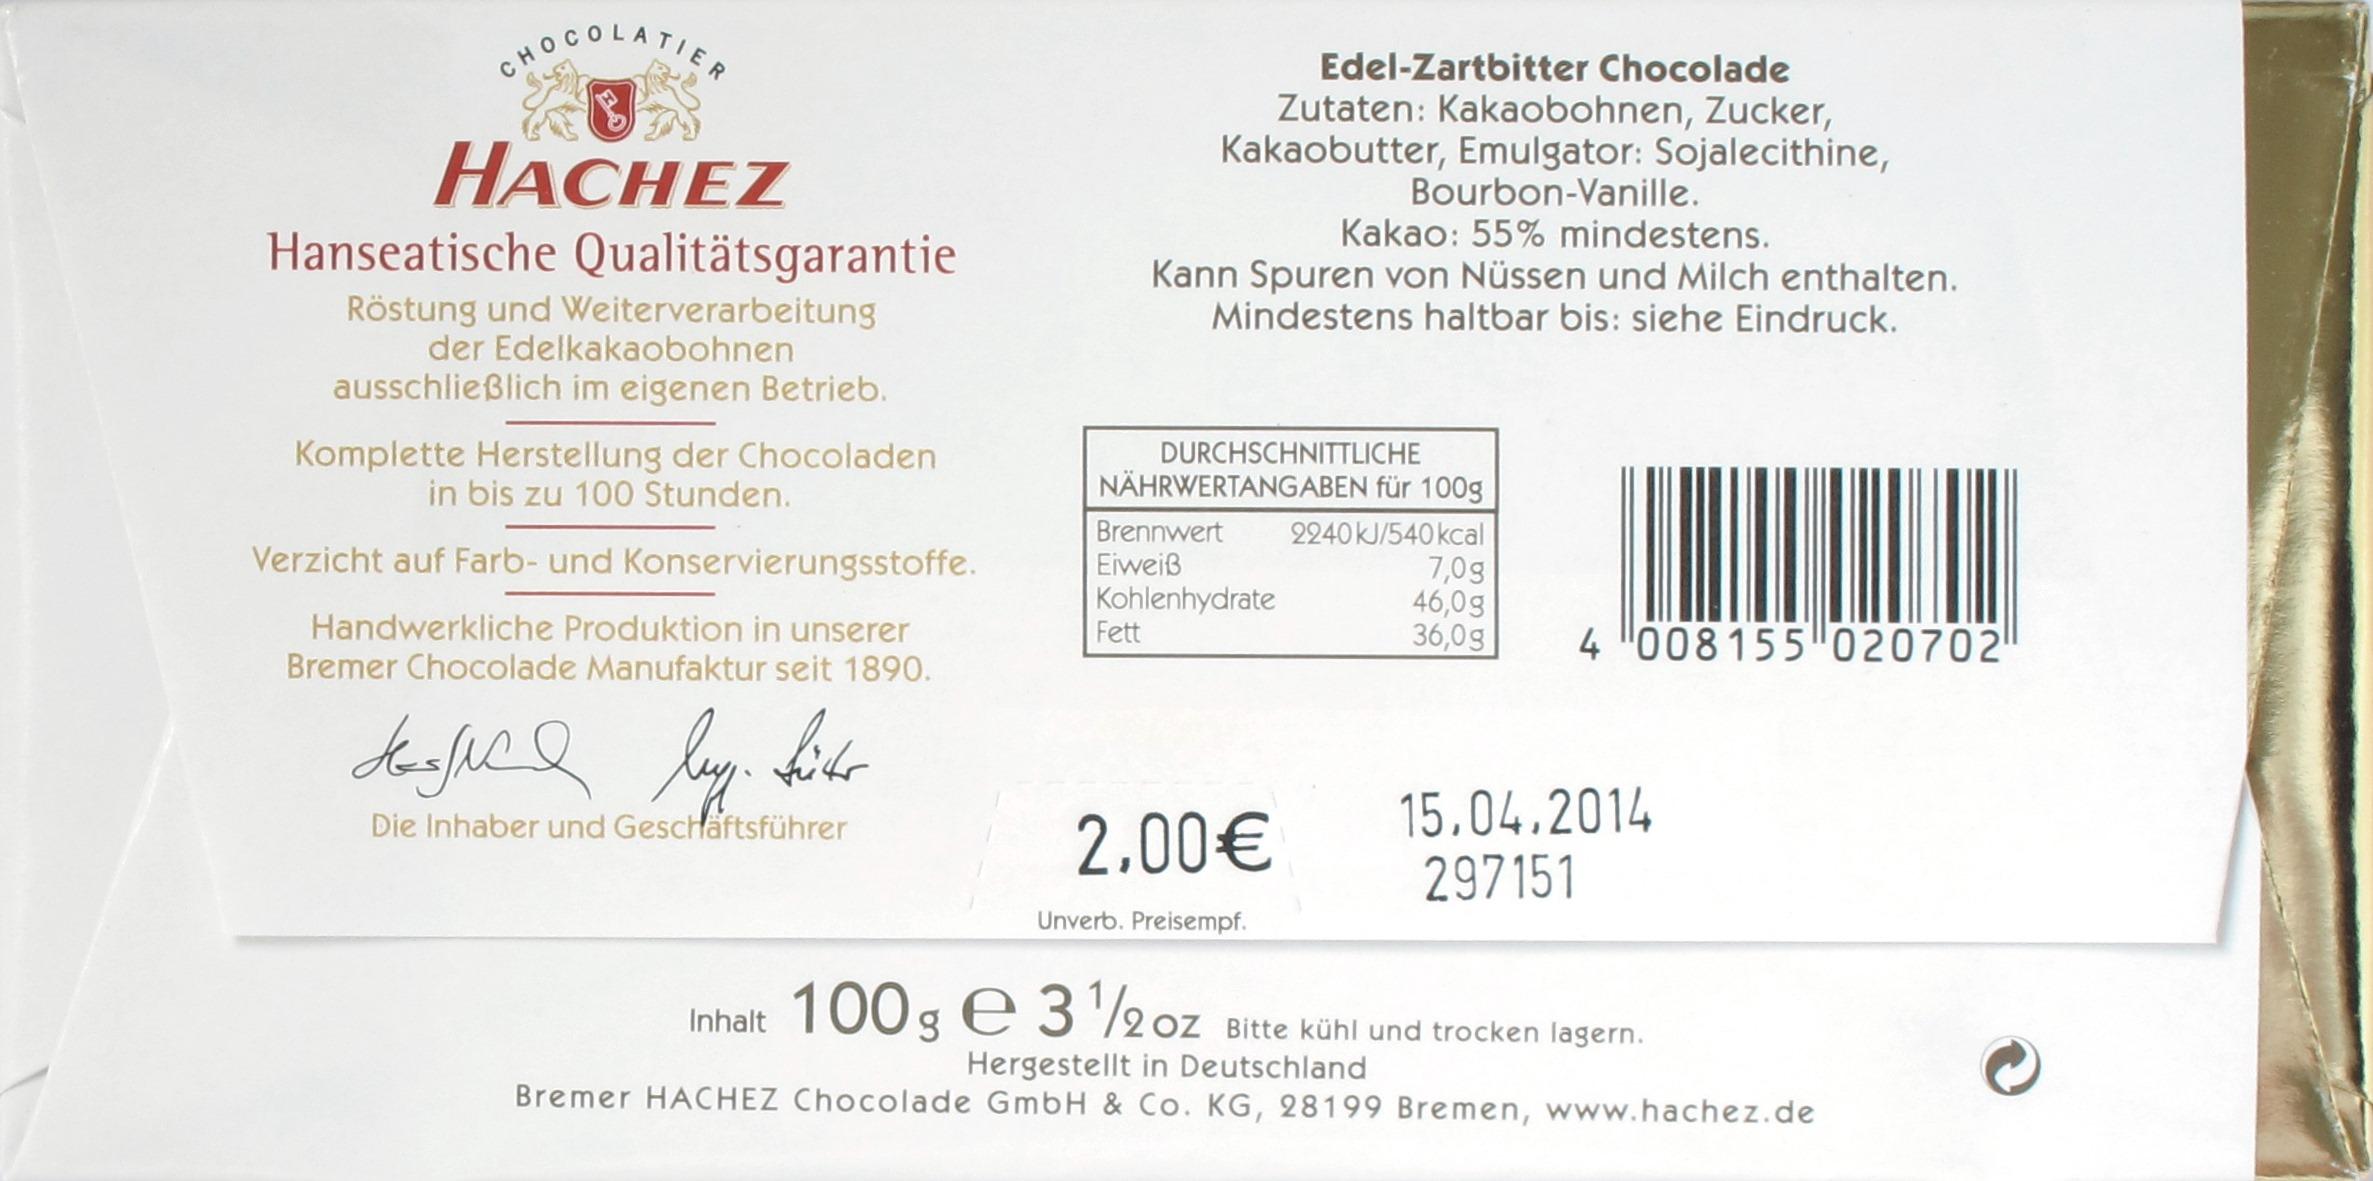 Hachez 55% Edel-Zartbitter-Schokolade, Rückseite